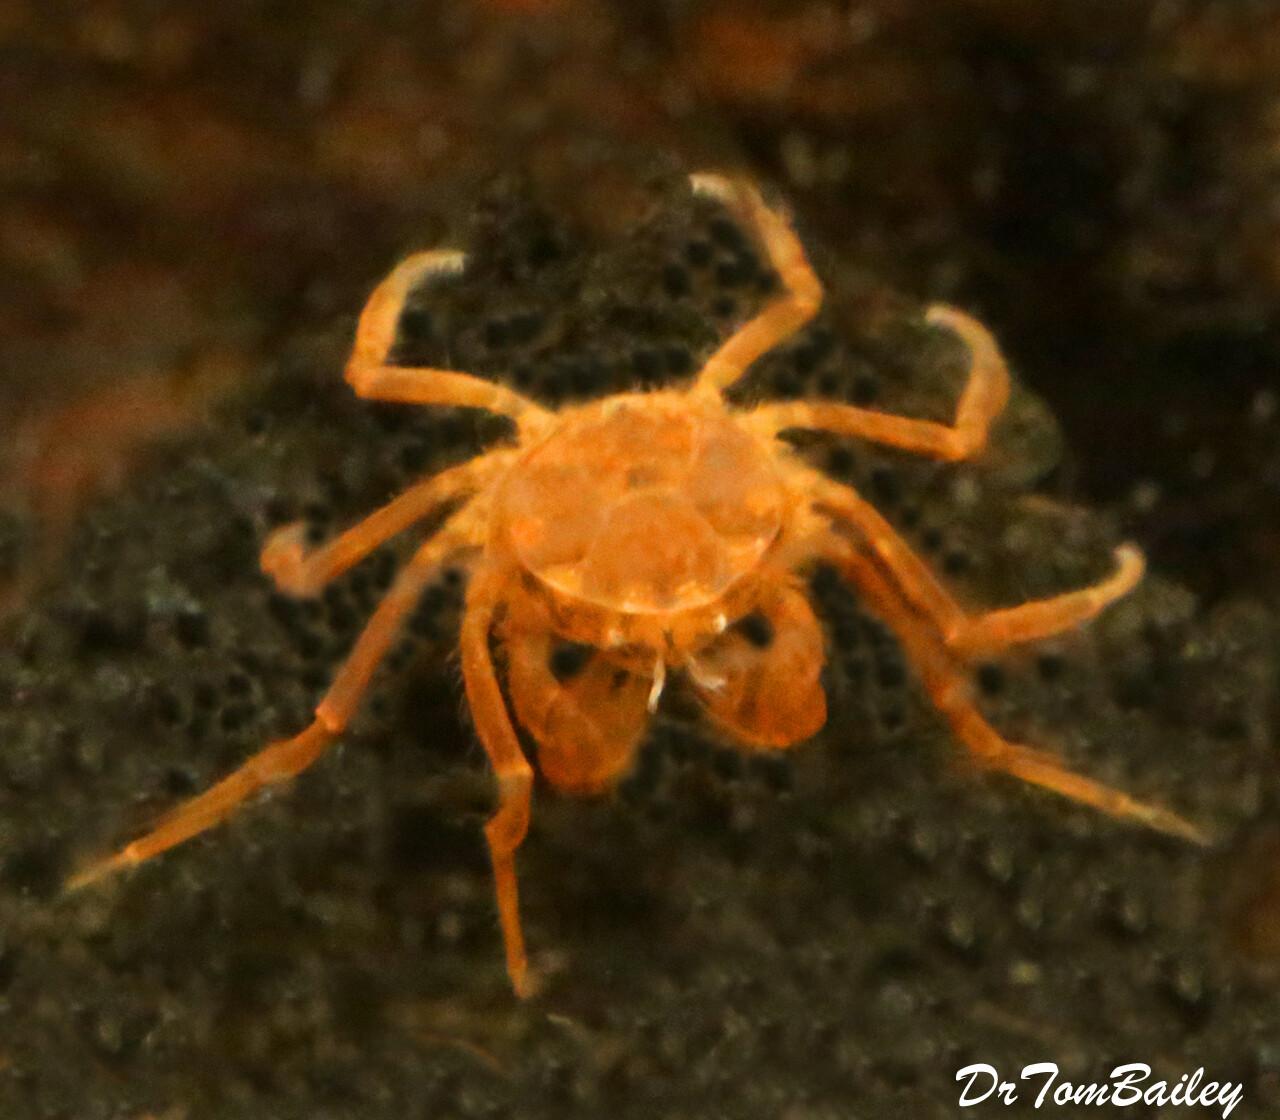 Premium WILD New, Freshwater Thai Micro Crab, Limnopilos naiyanetri, Nano Crab